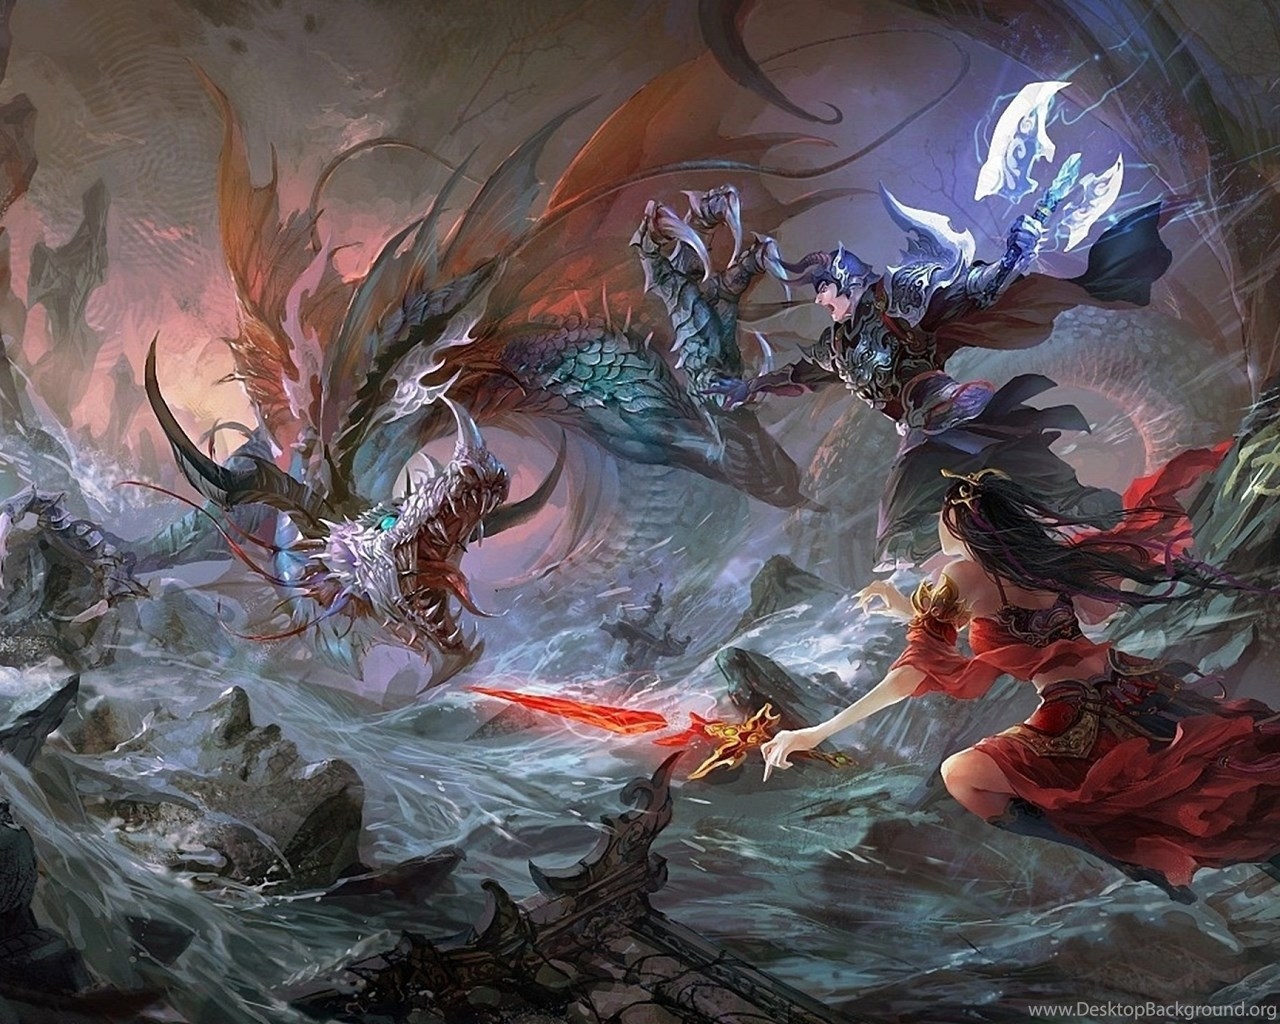 Fantasy Battle Fighting Warrior Action Art Artwork Wallpapers Desktop Background